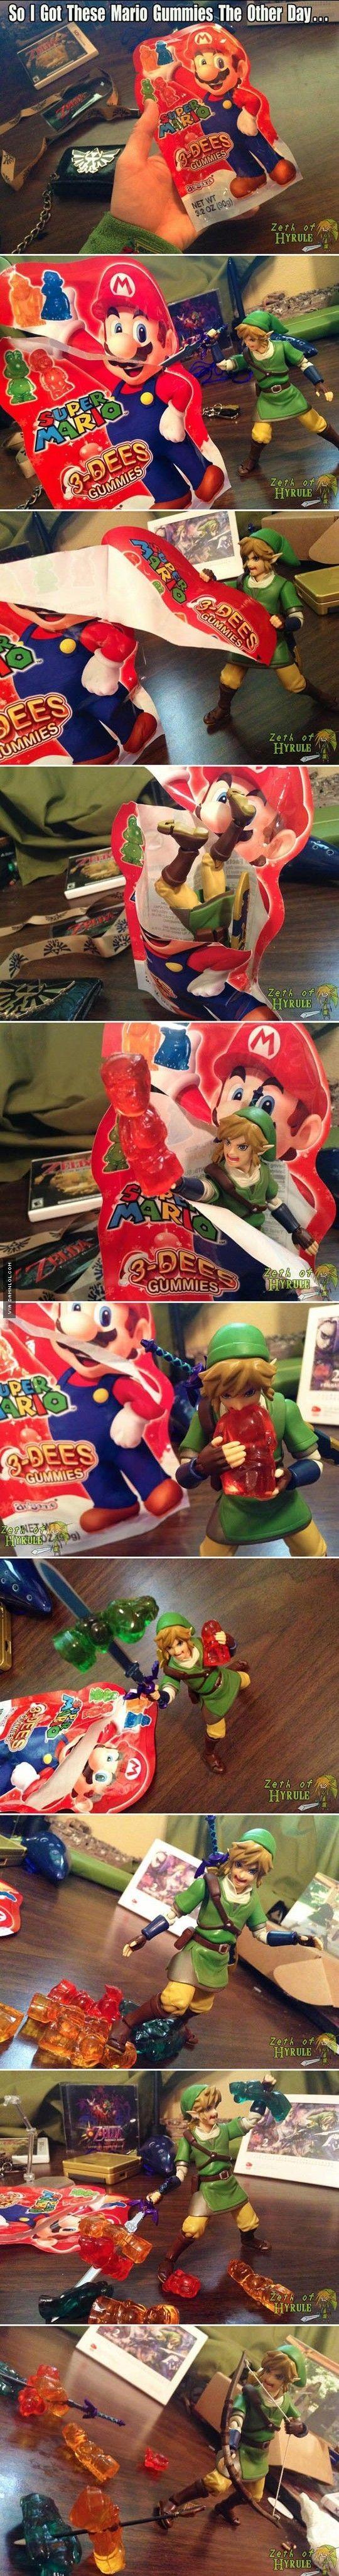 Best Way To Eat Gummies - Damn! LOL